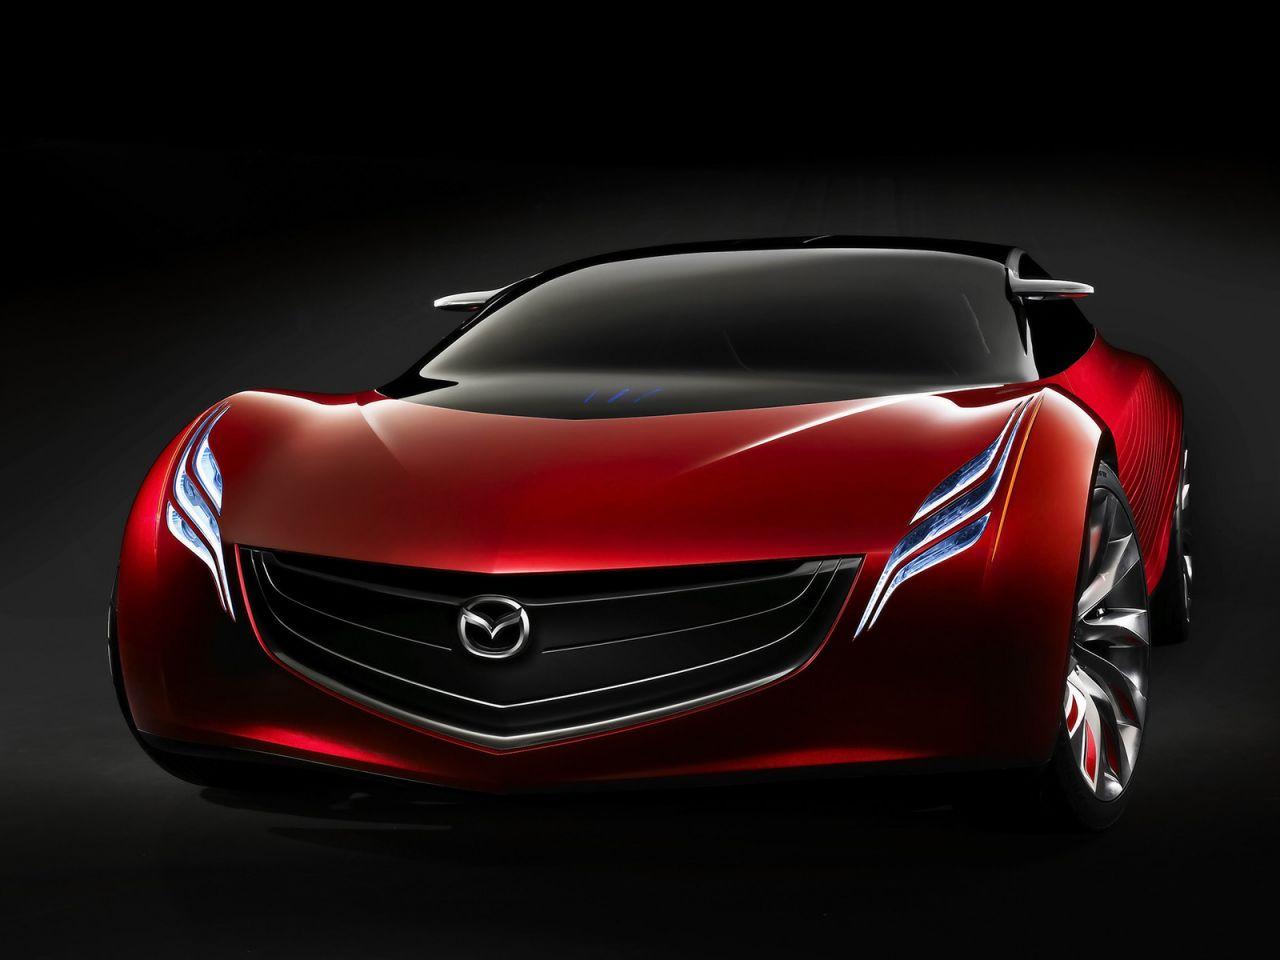 Mazda Ryuga Concept Front Low Angle Wallpaper 1280x960